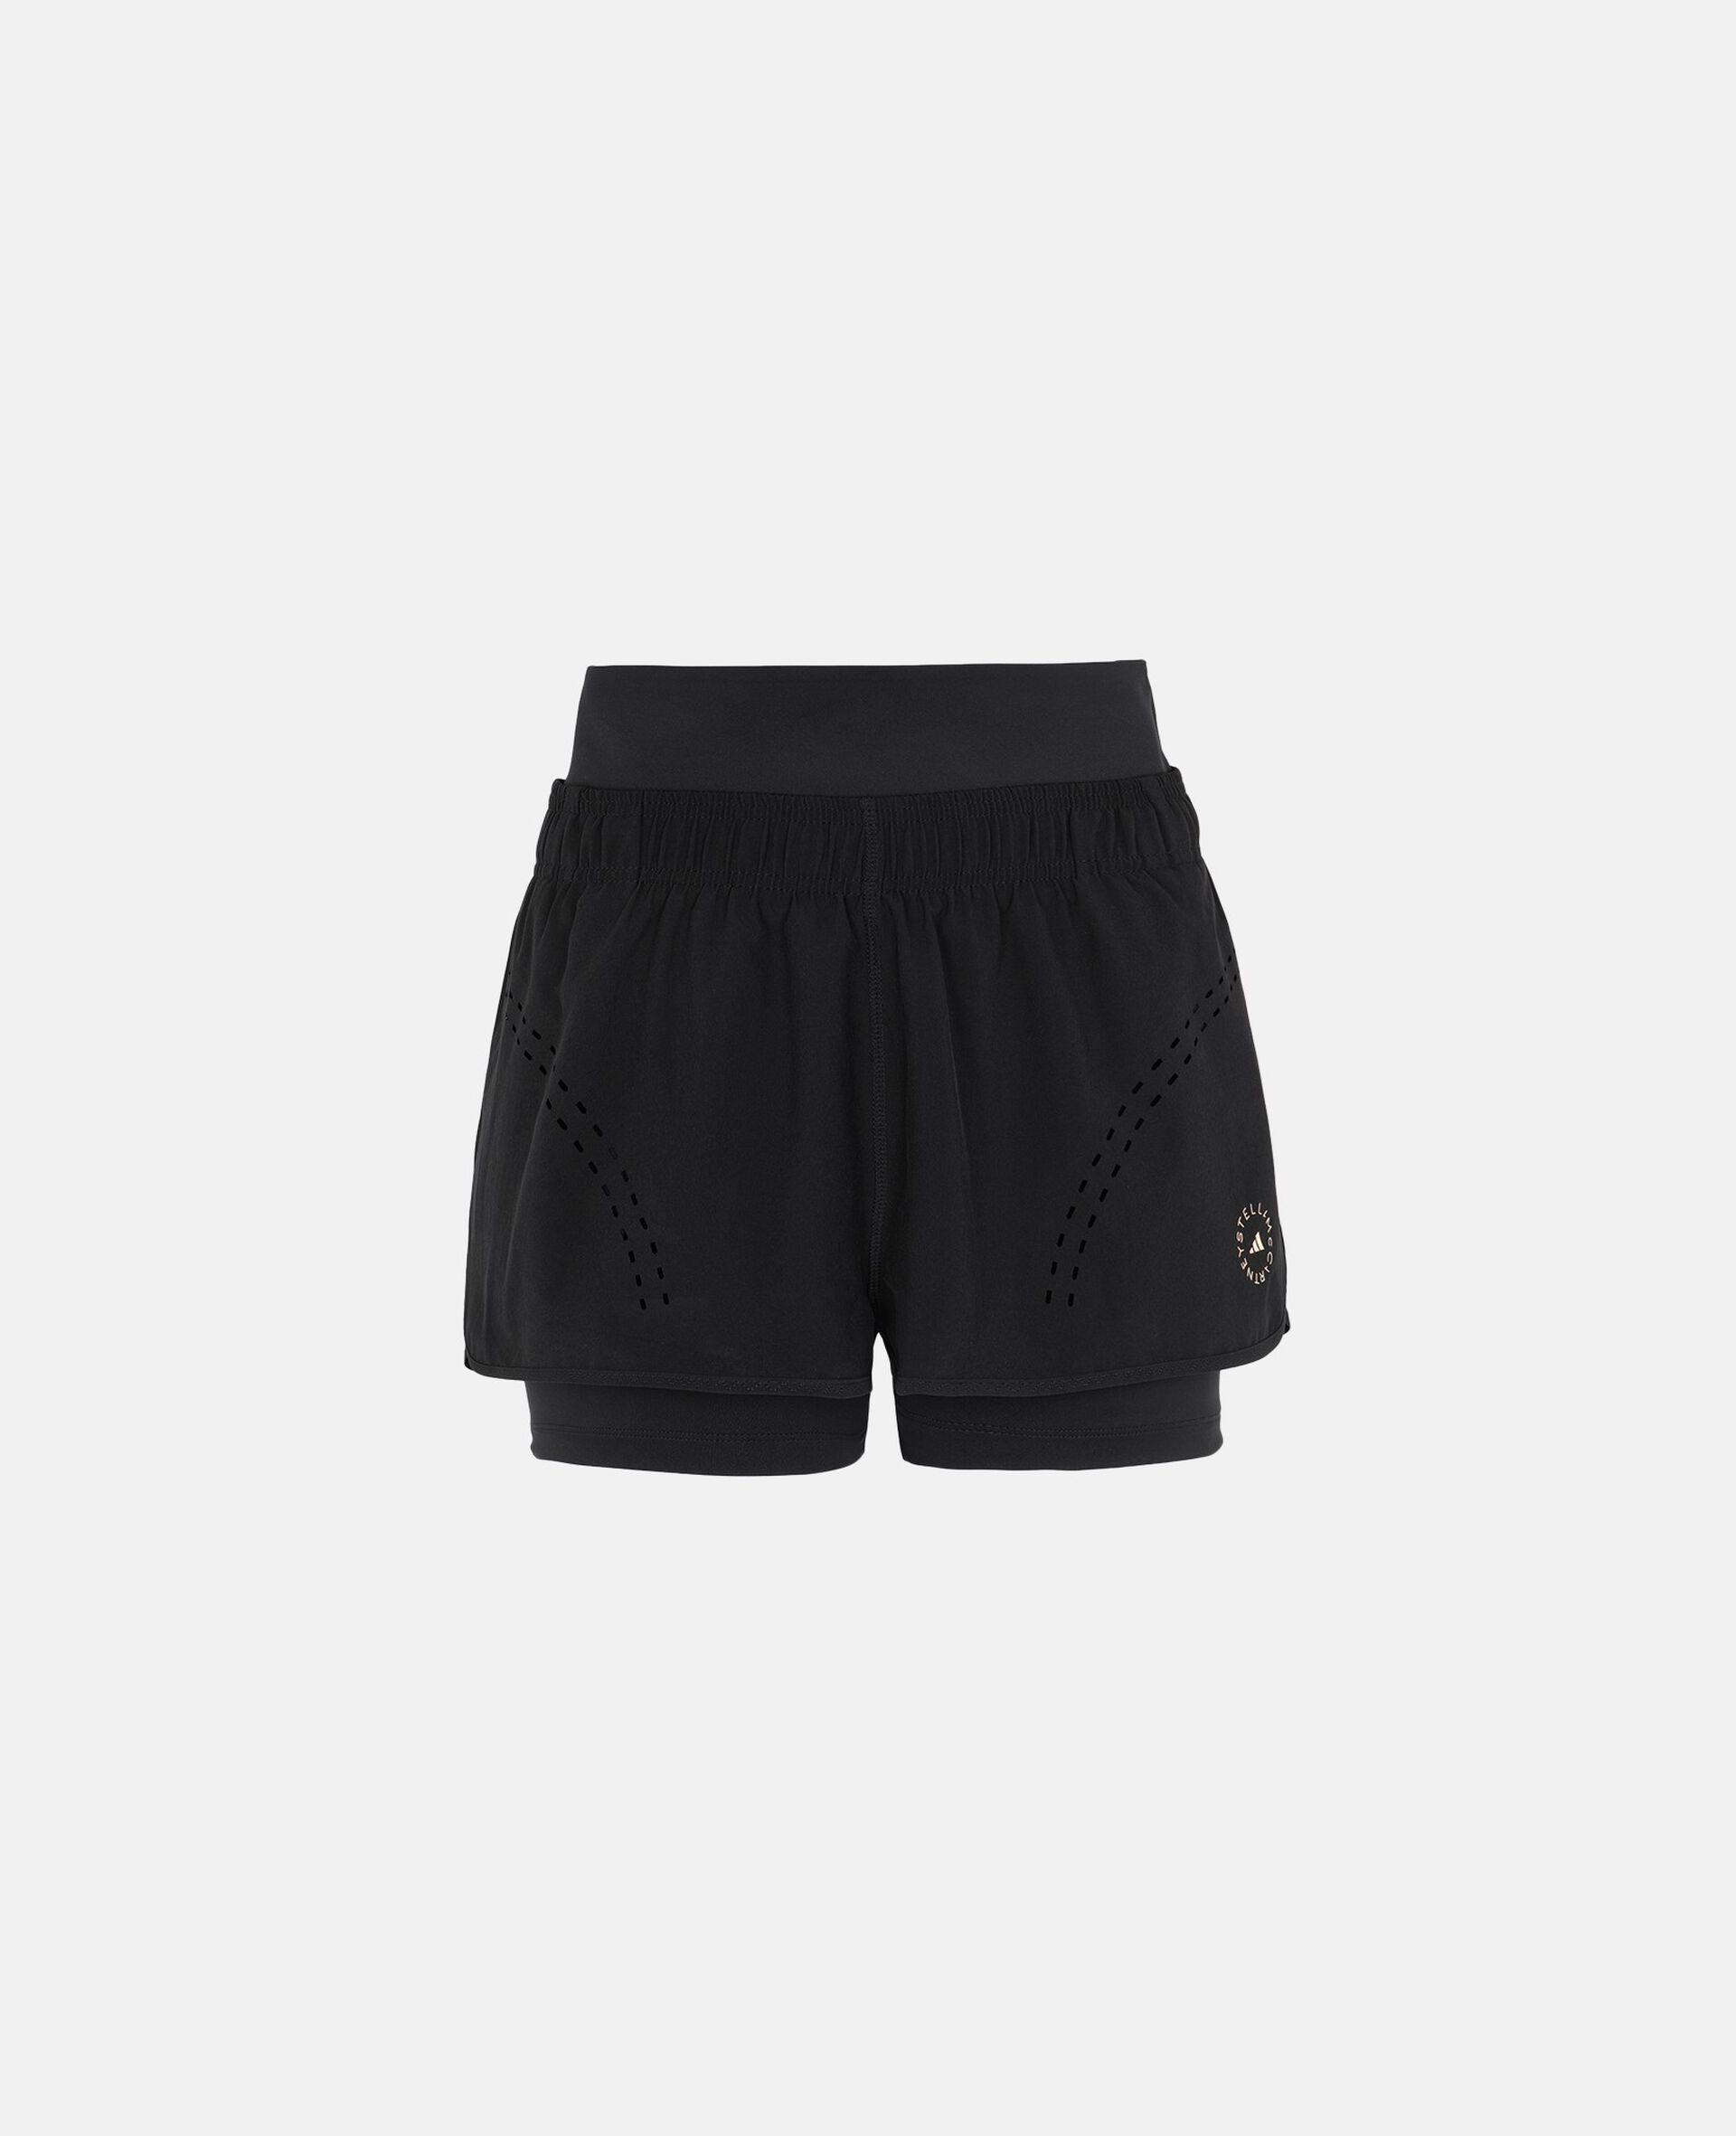 Schwarze TruePurpose Sport-Shorts-Schwarz-large image number 0